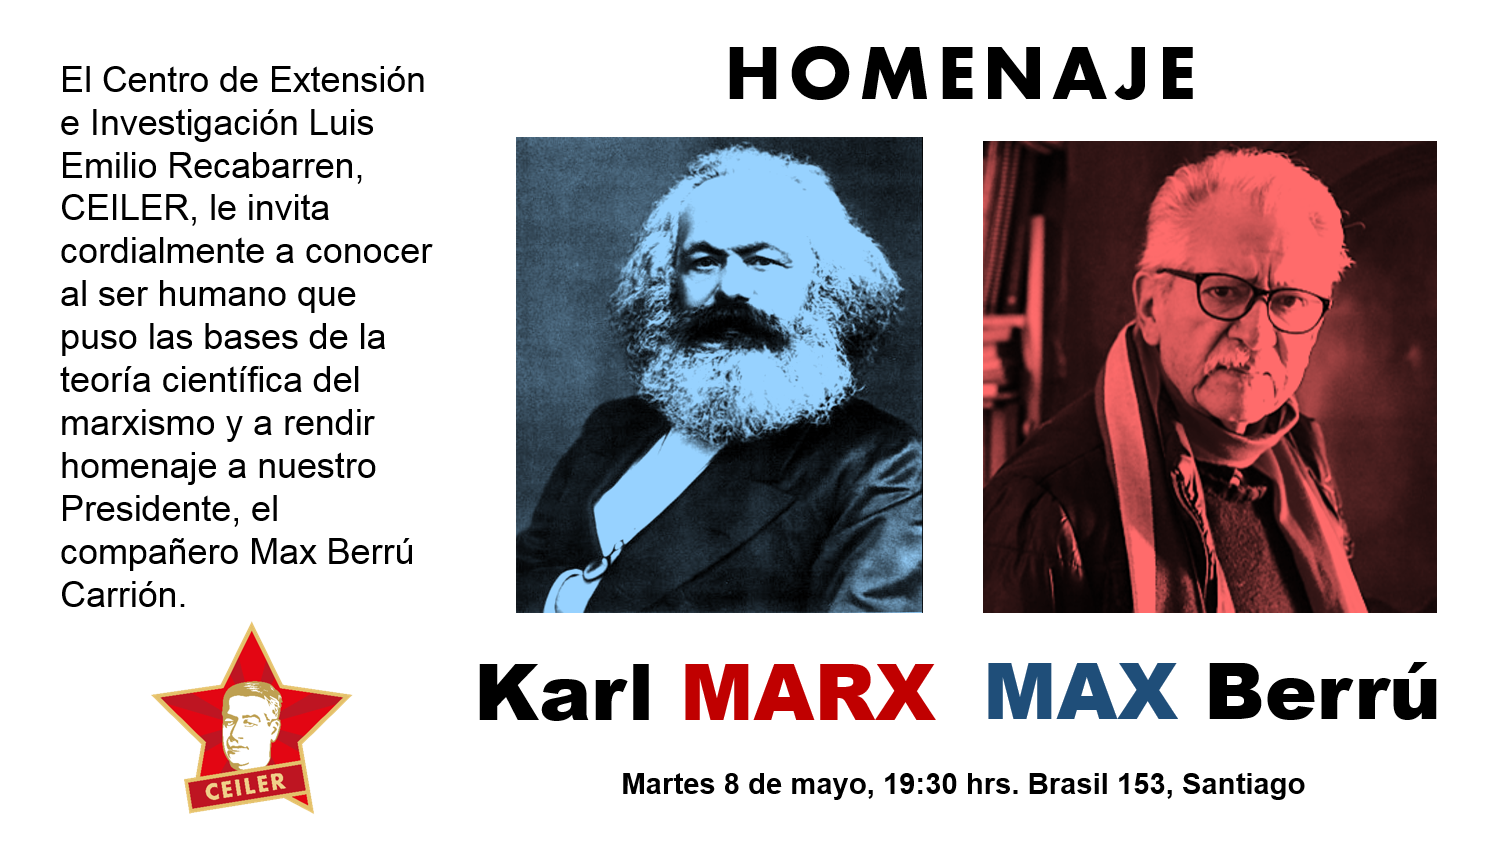 Homenaje a Karl Marx y Max Berrú